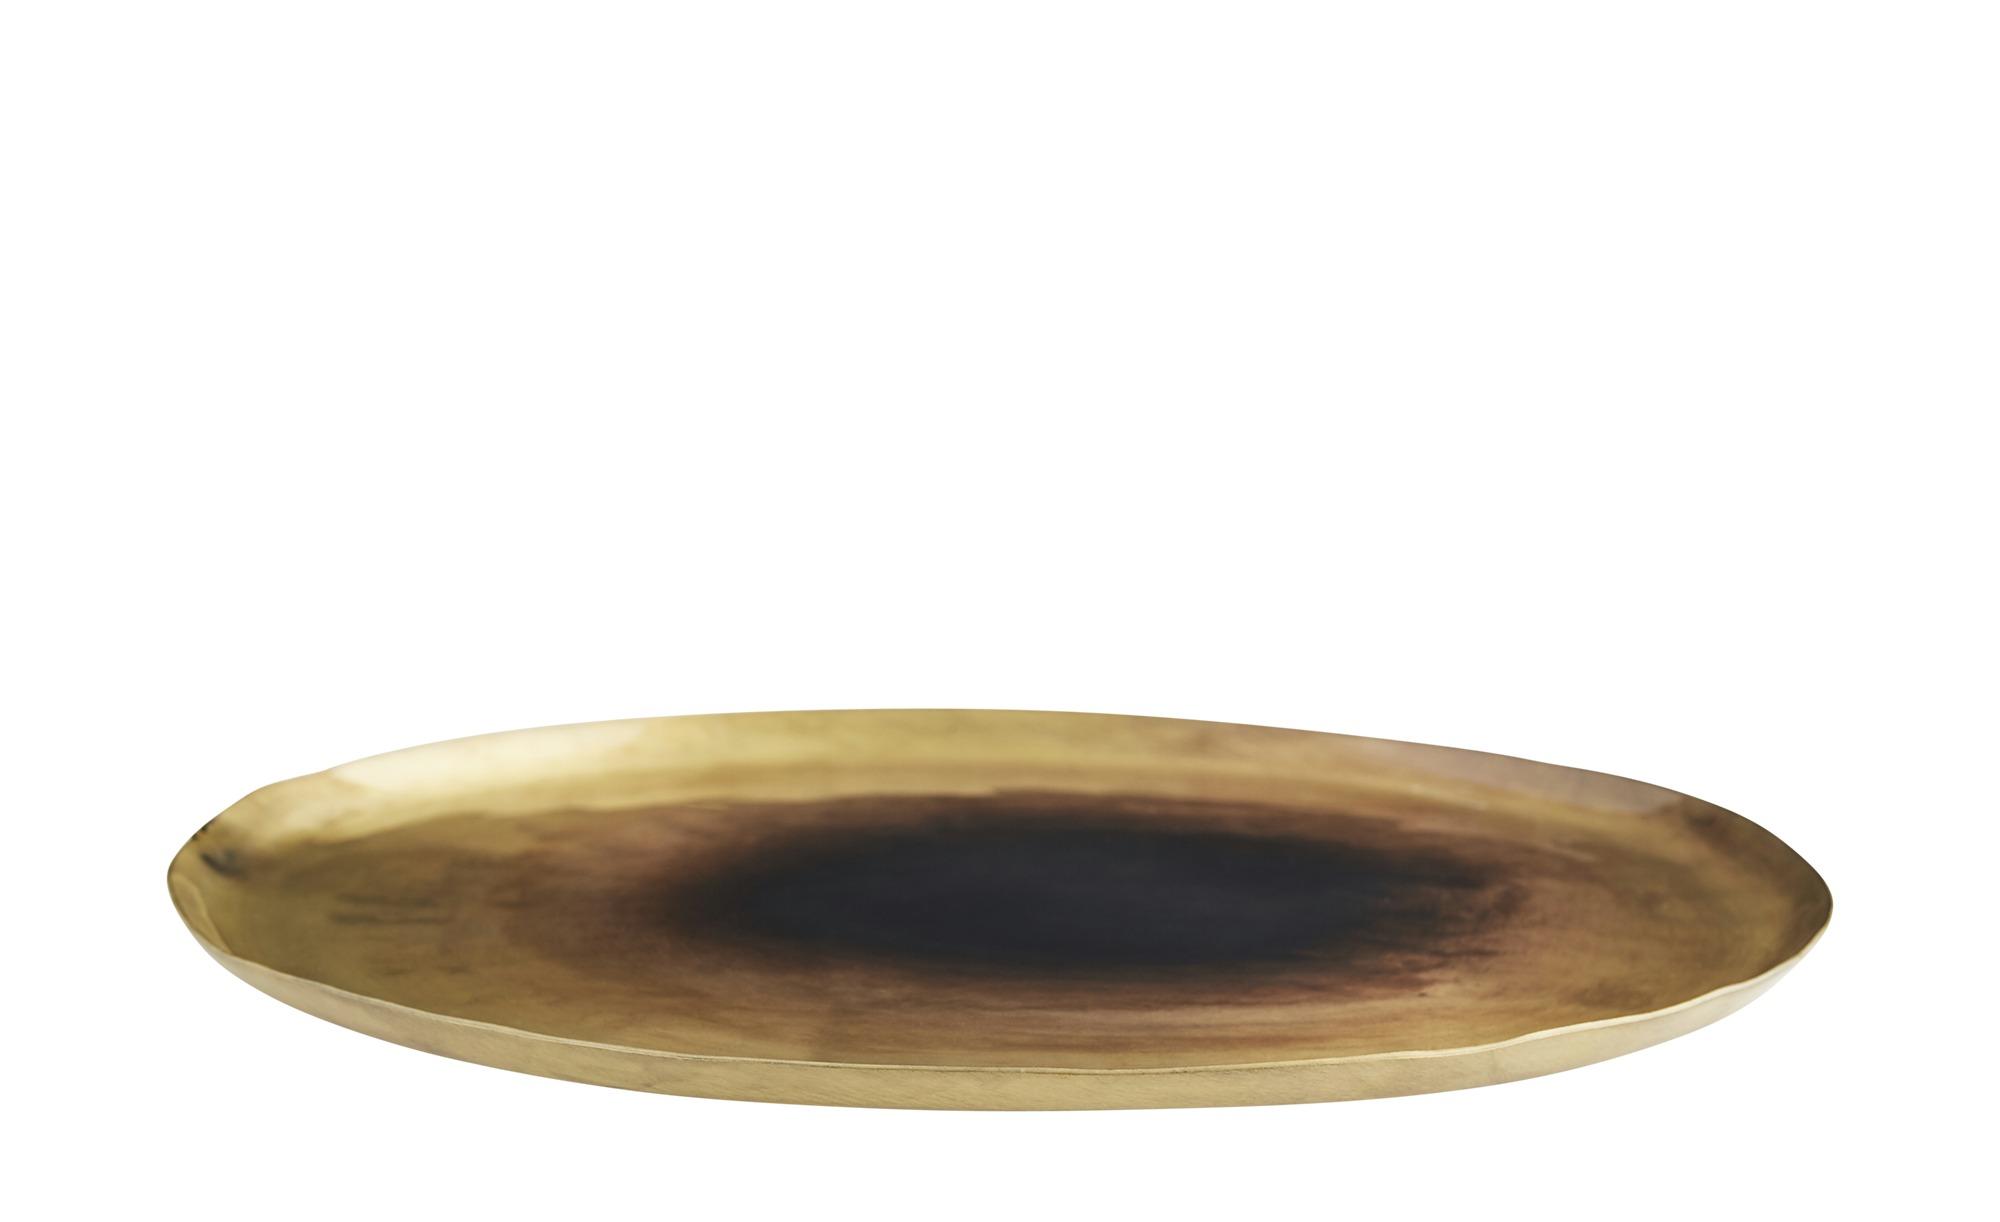 Schale Teller Rund Metall Tablett Antik Gold Bronze Deko Naturals Collections